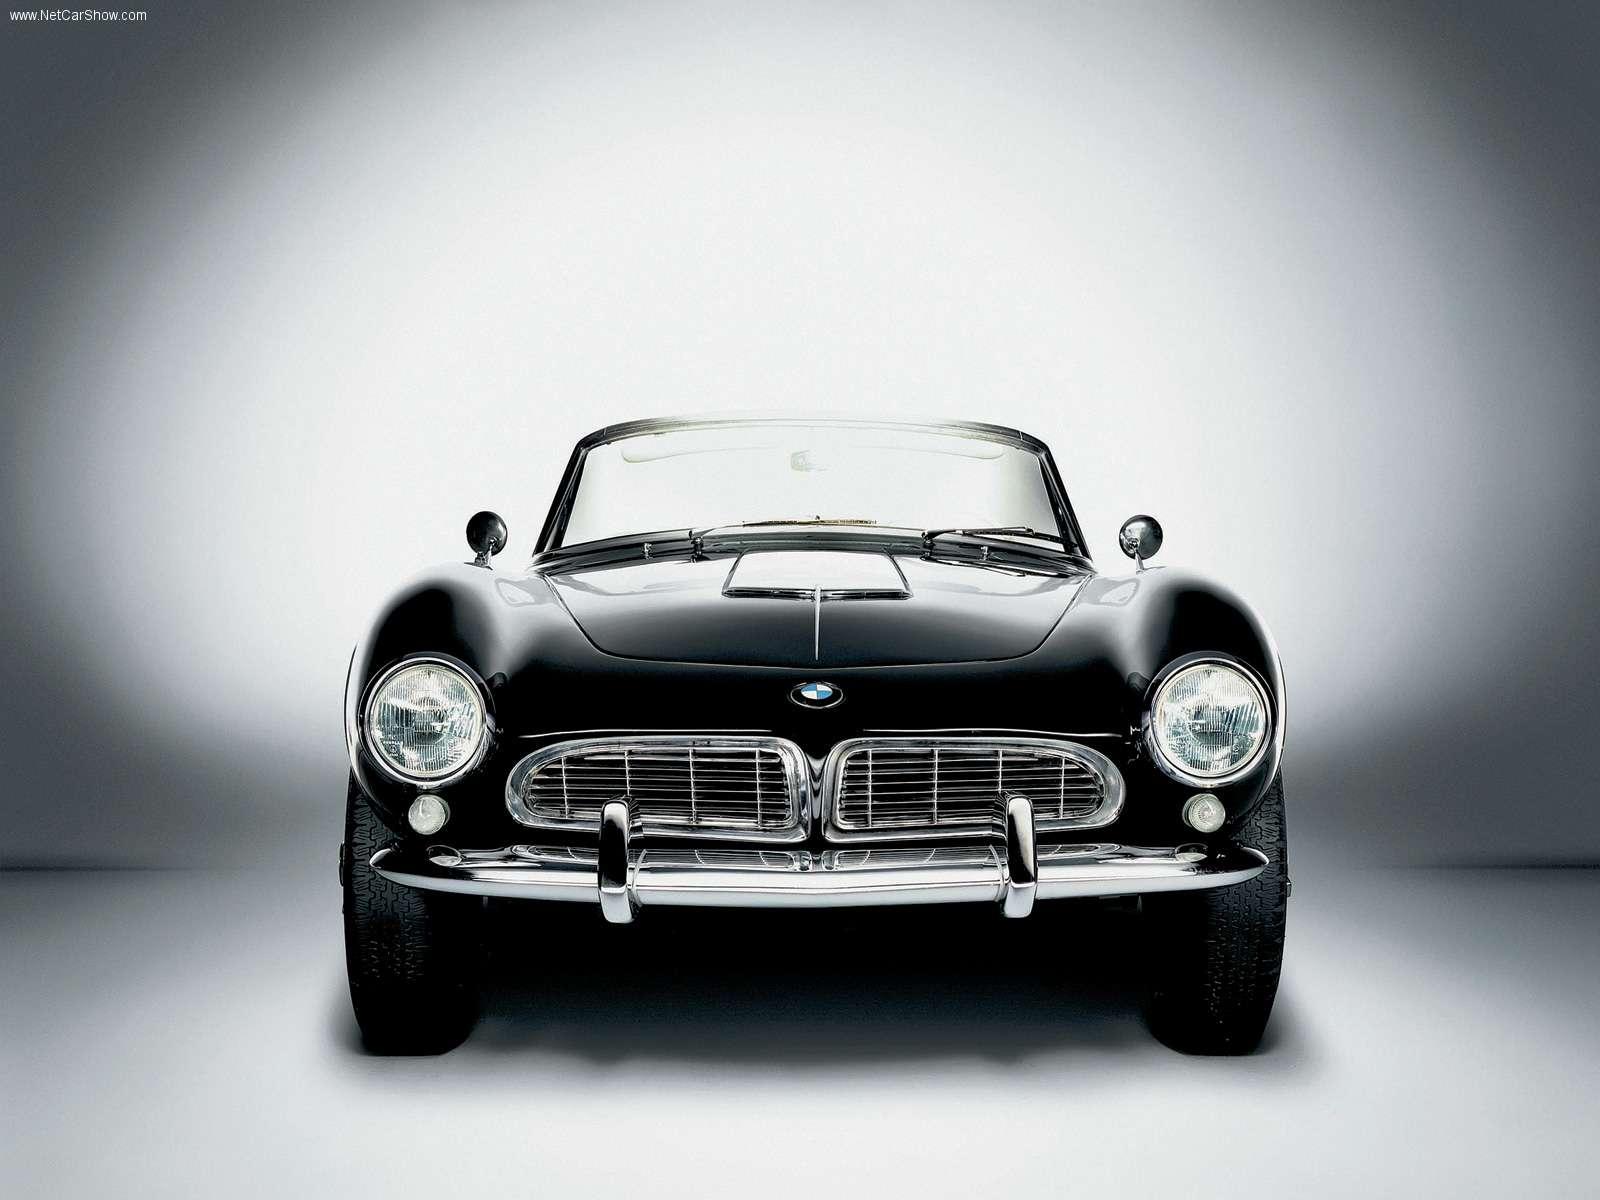 bmw-507-1955-1600-04